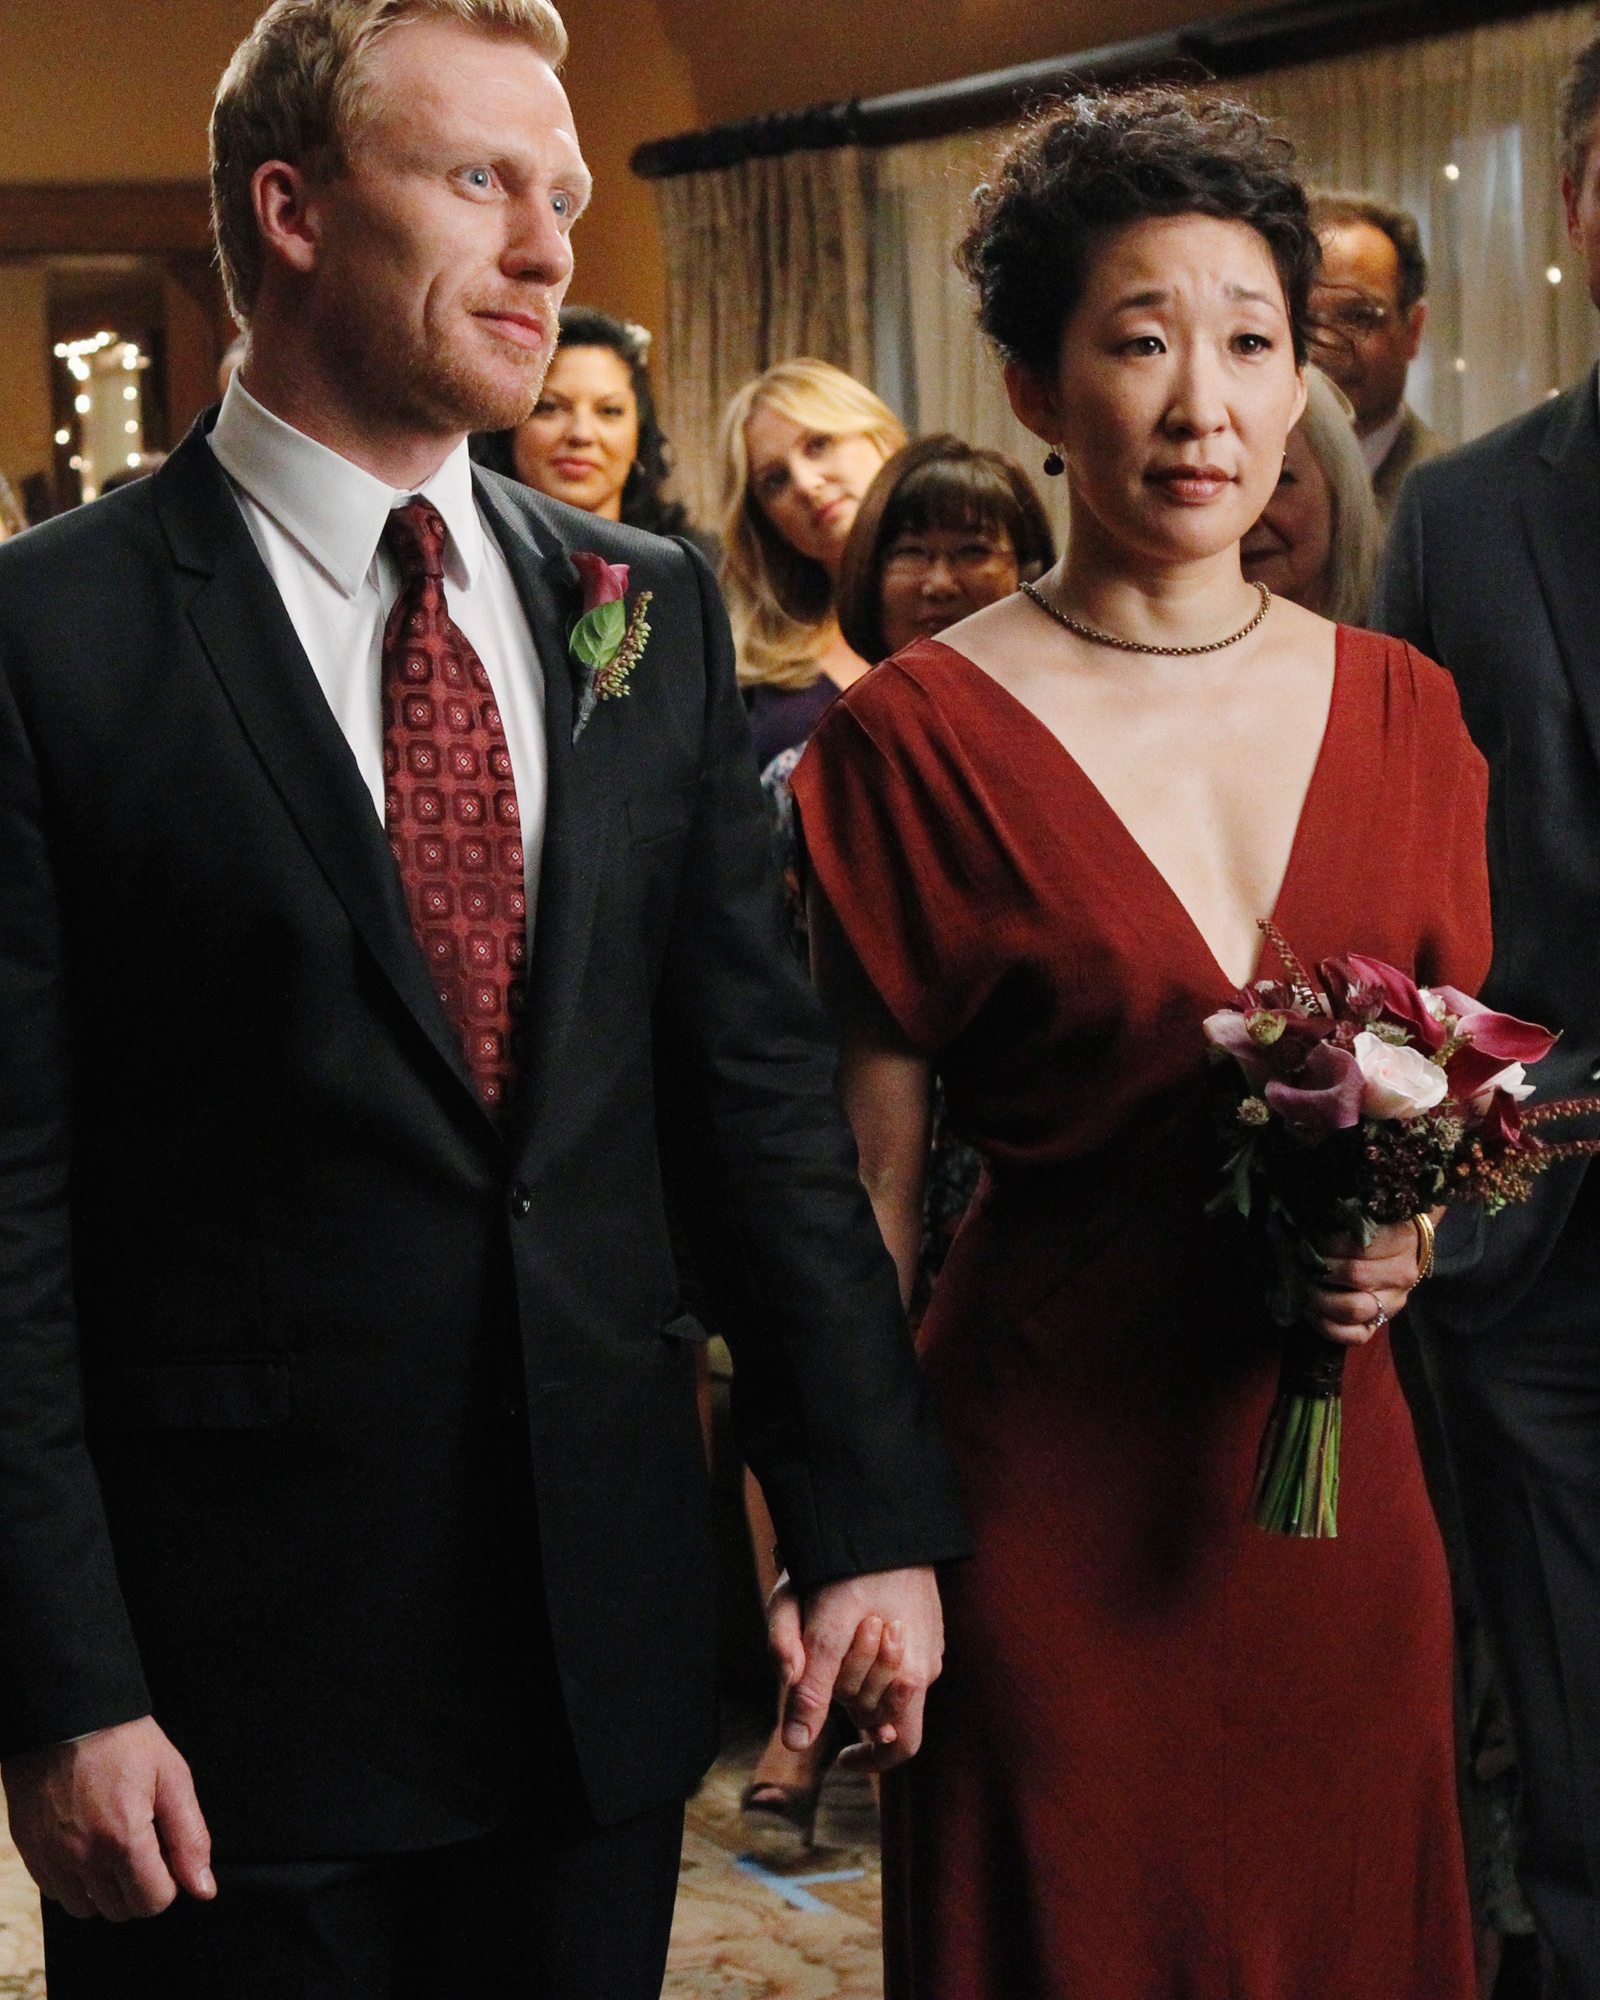 tv-wedding-dresses-greys-anatomy-cristina-yang-dress-1115.jpg